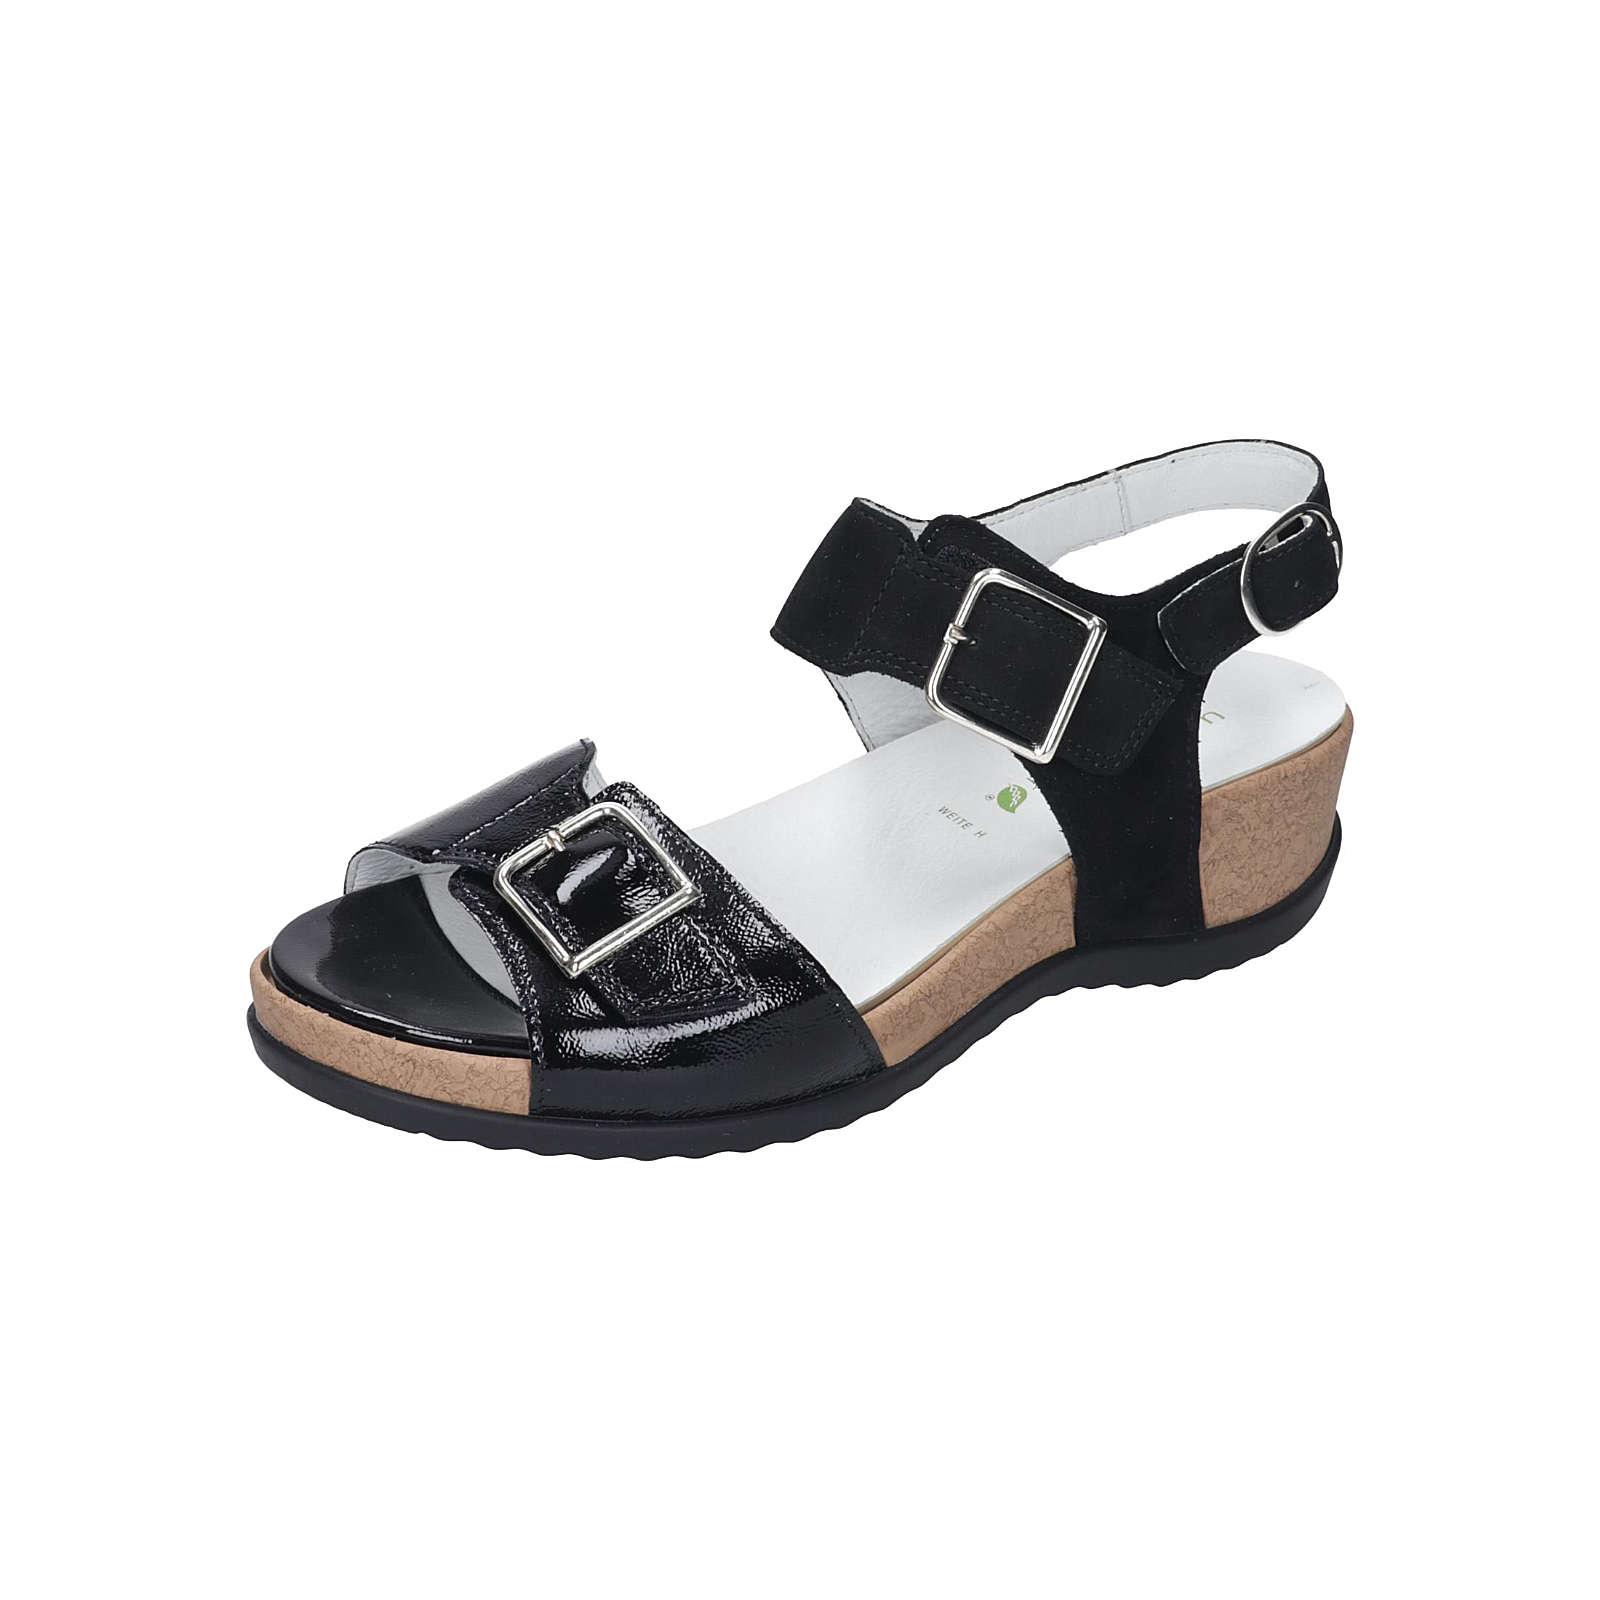 WALDLÄUFER Damen Sandale Komfort-Sandalen schwarz Damen Gr. 36 2/3